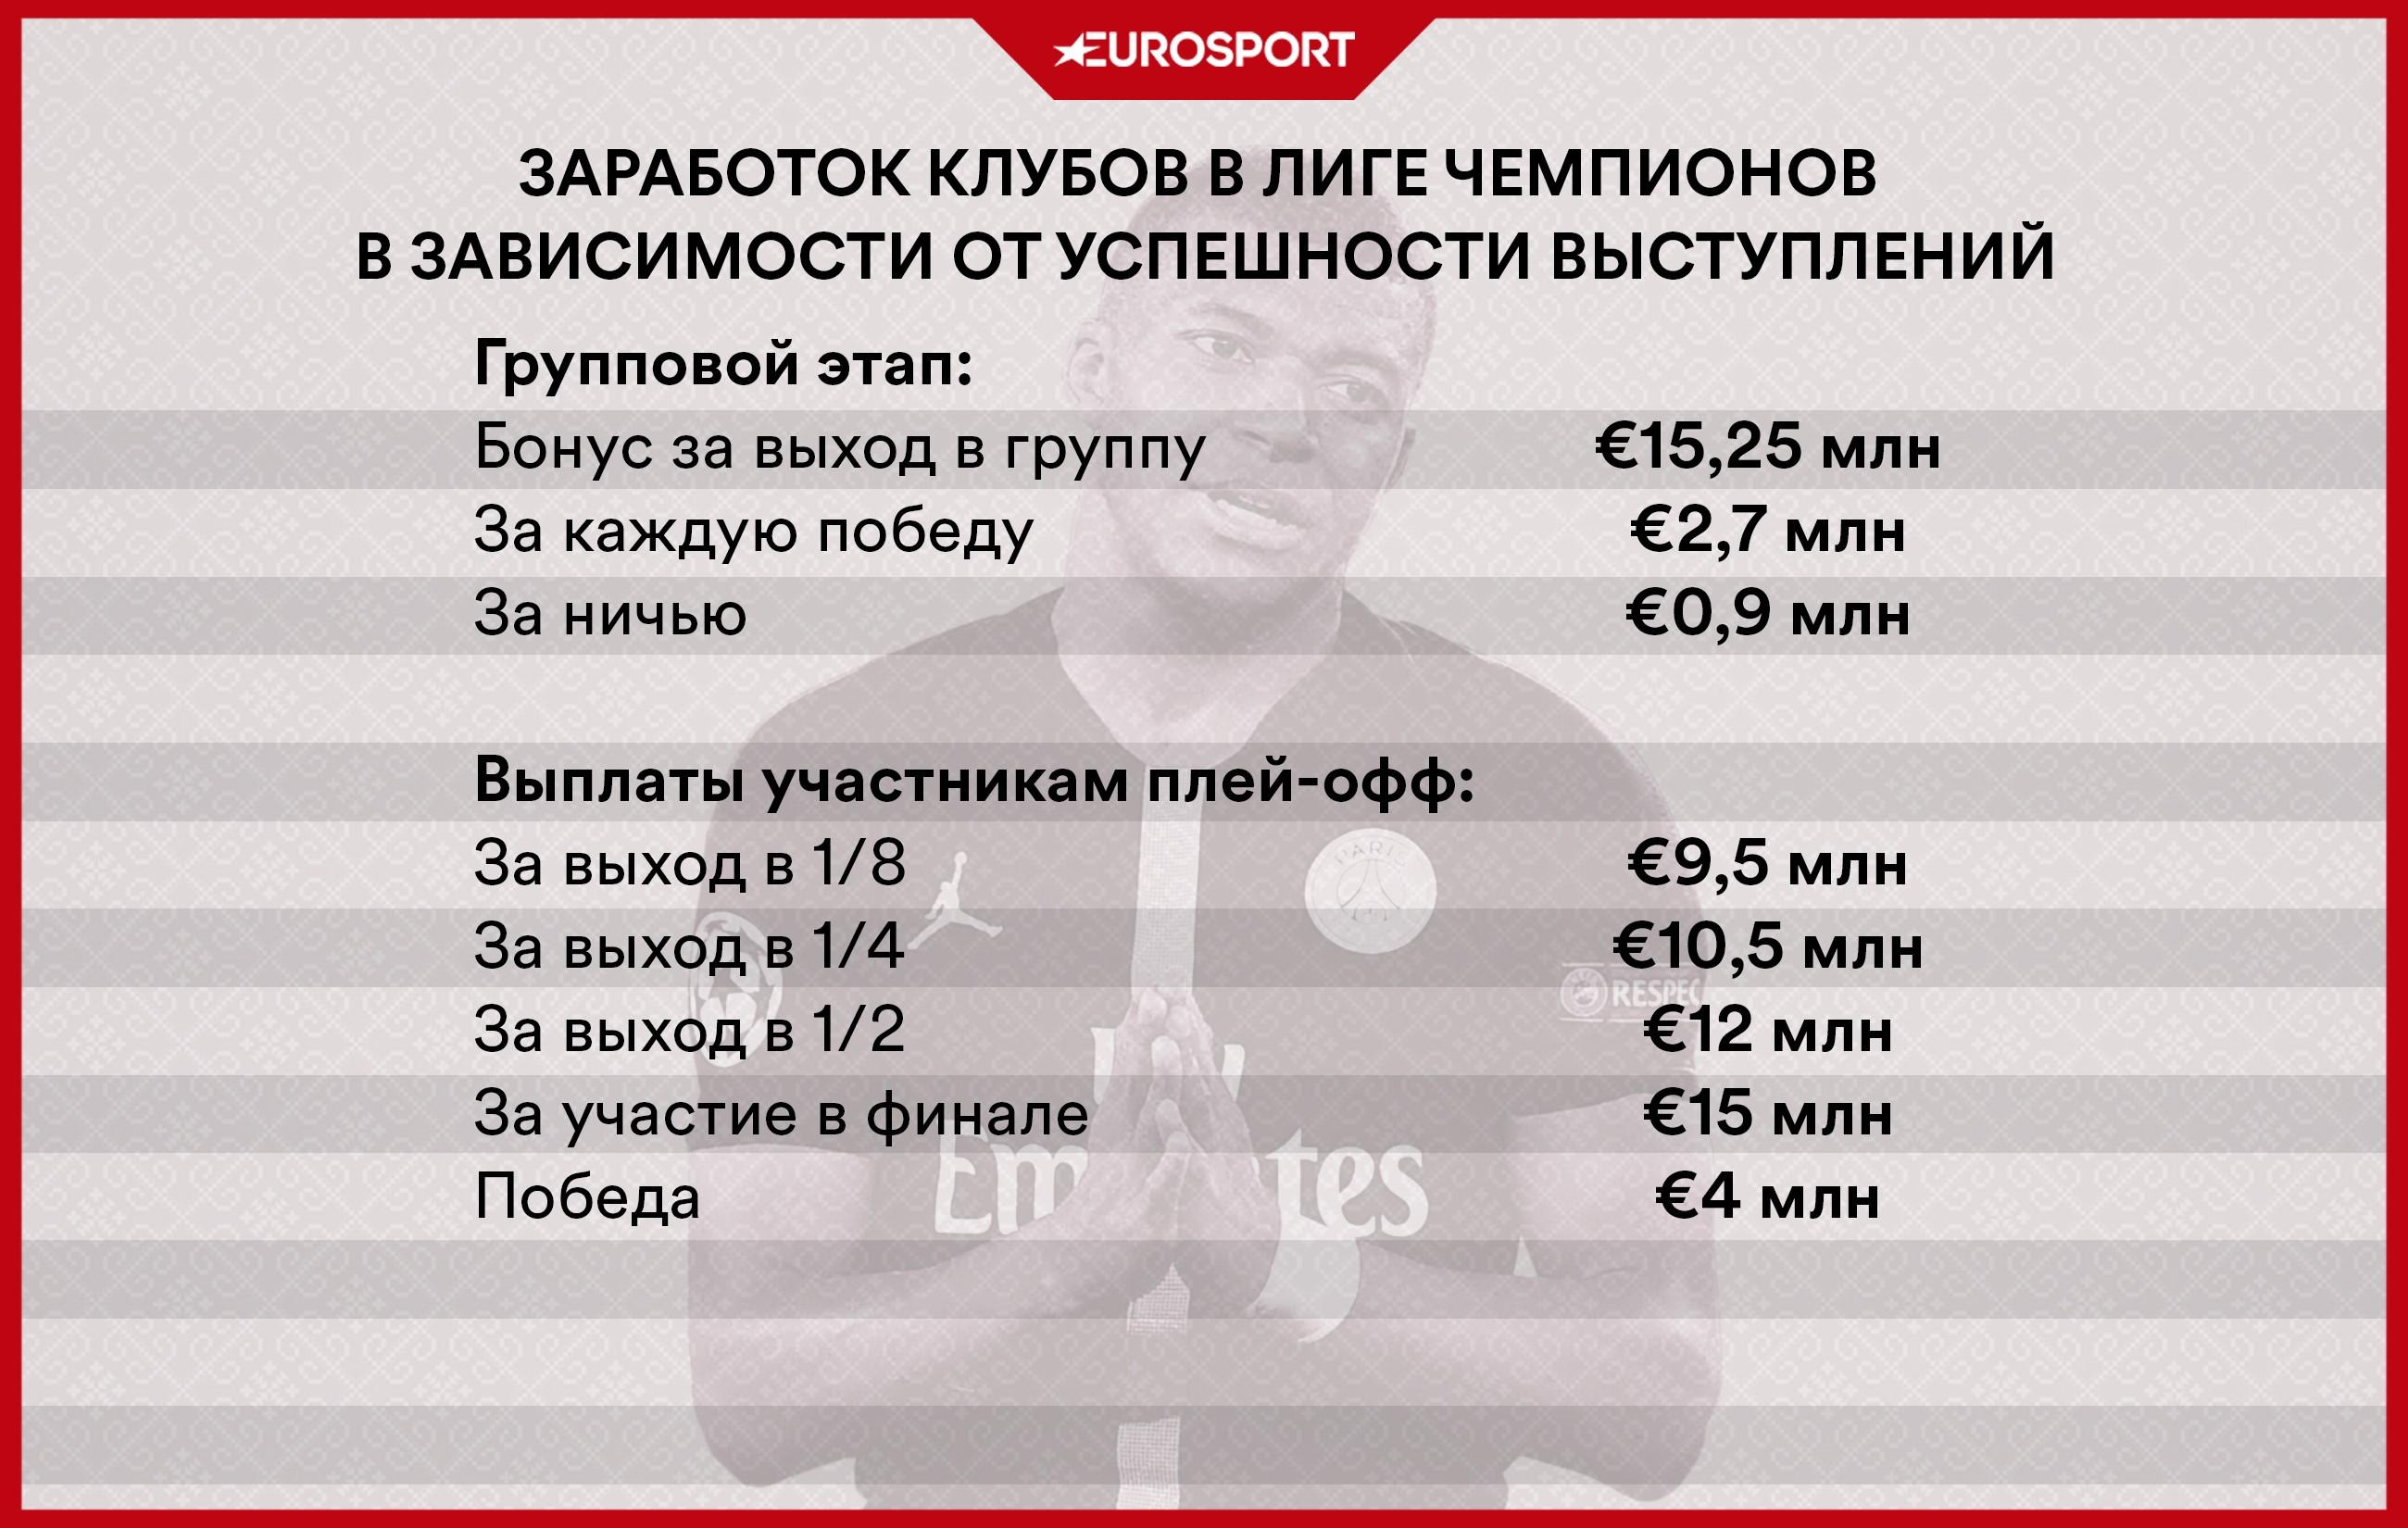 https://i.eurosport.com/2021/04/13/3062382.jpg